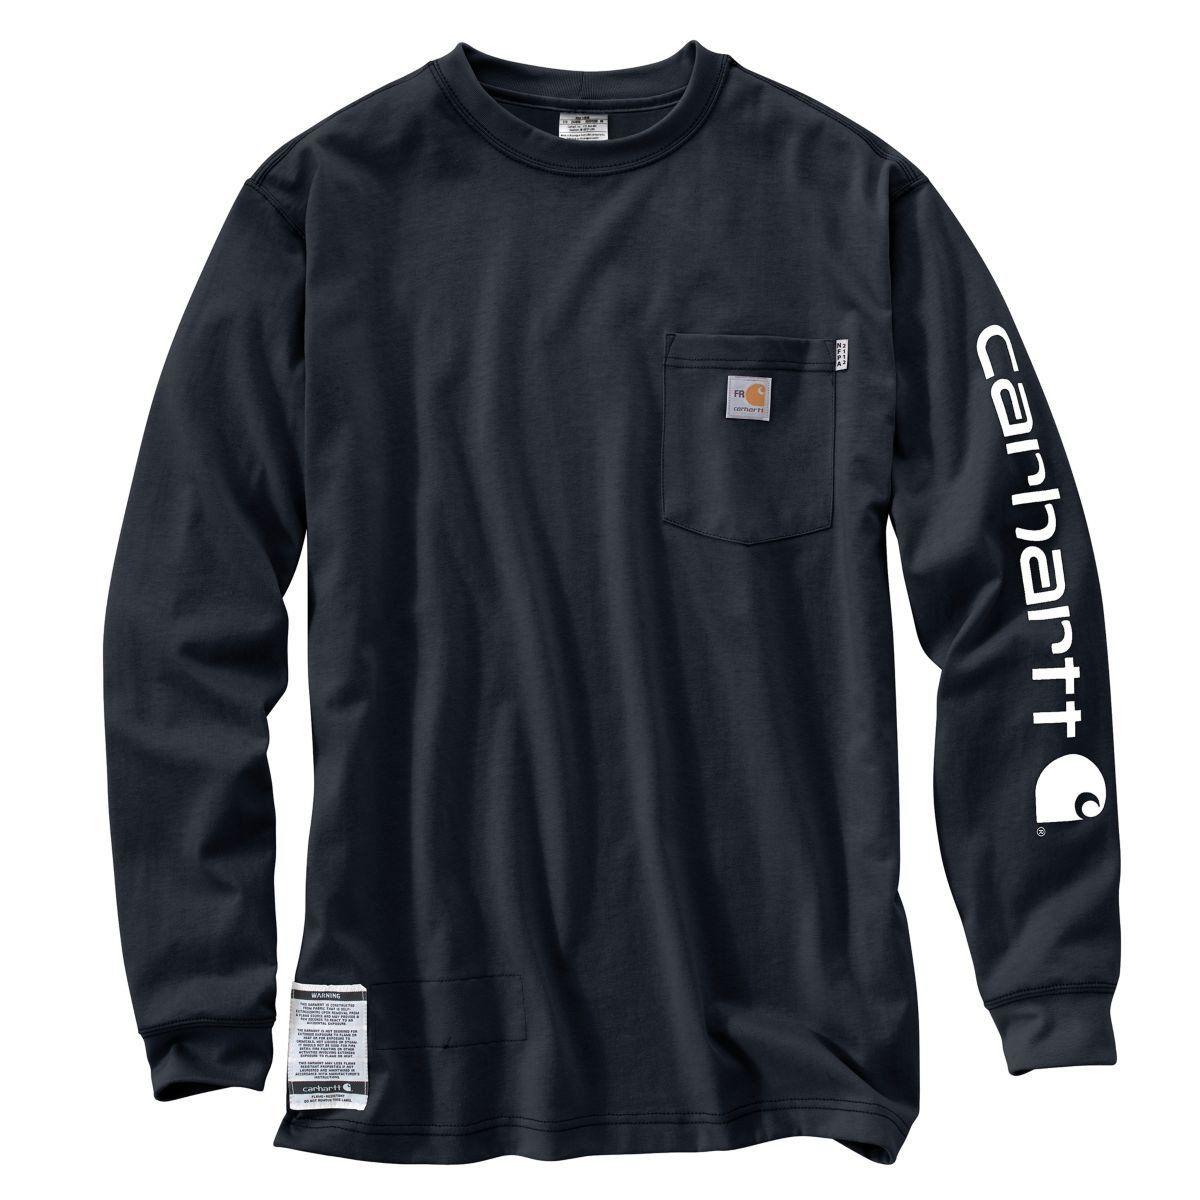 Carhartt Men S Dark Navy Flame Resistant Force Cotton Graphic Long Sleeve T Shirt Carhartt Shirts Work Shirts